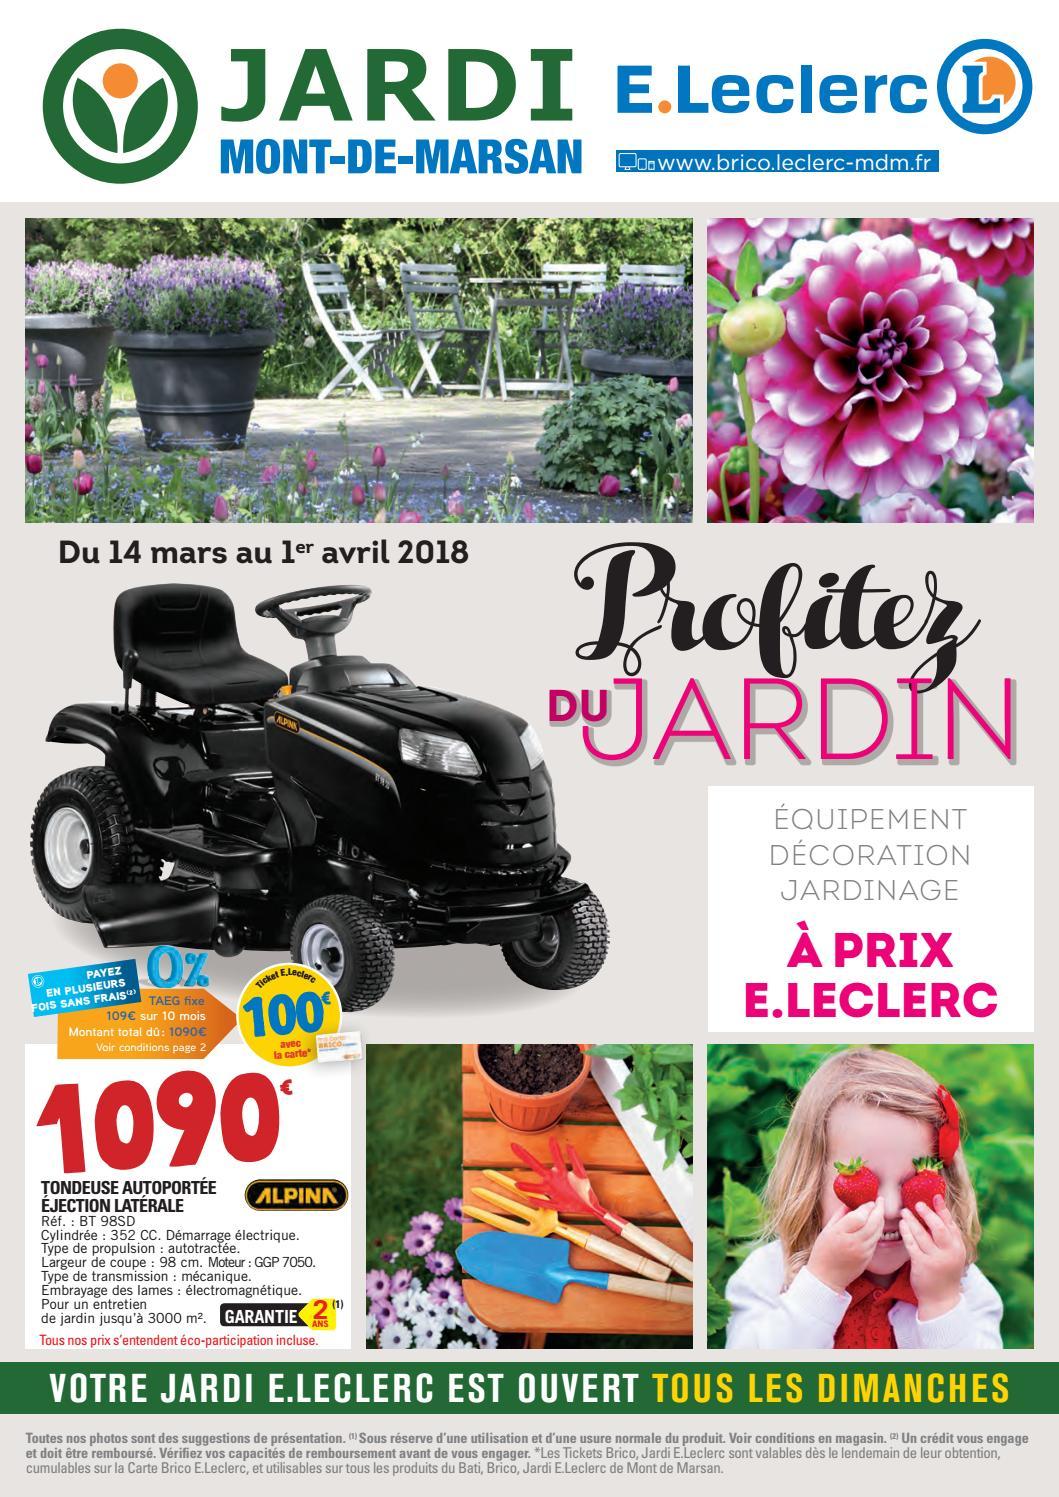 Catalogue Jardin - Jardi E.leclerc By Chou Magazine - Issuu intérieur Abris De Jardin Leclerc